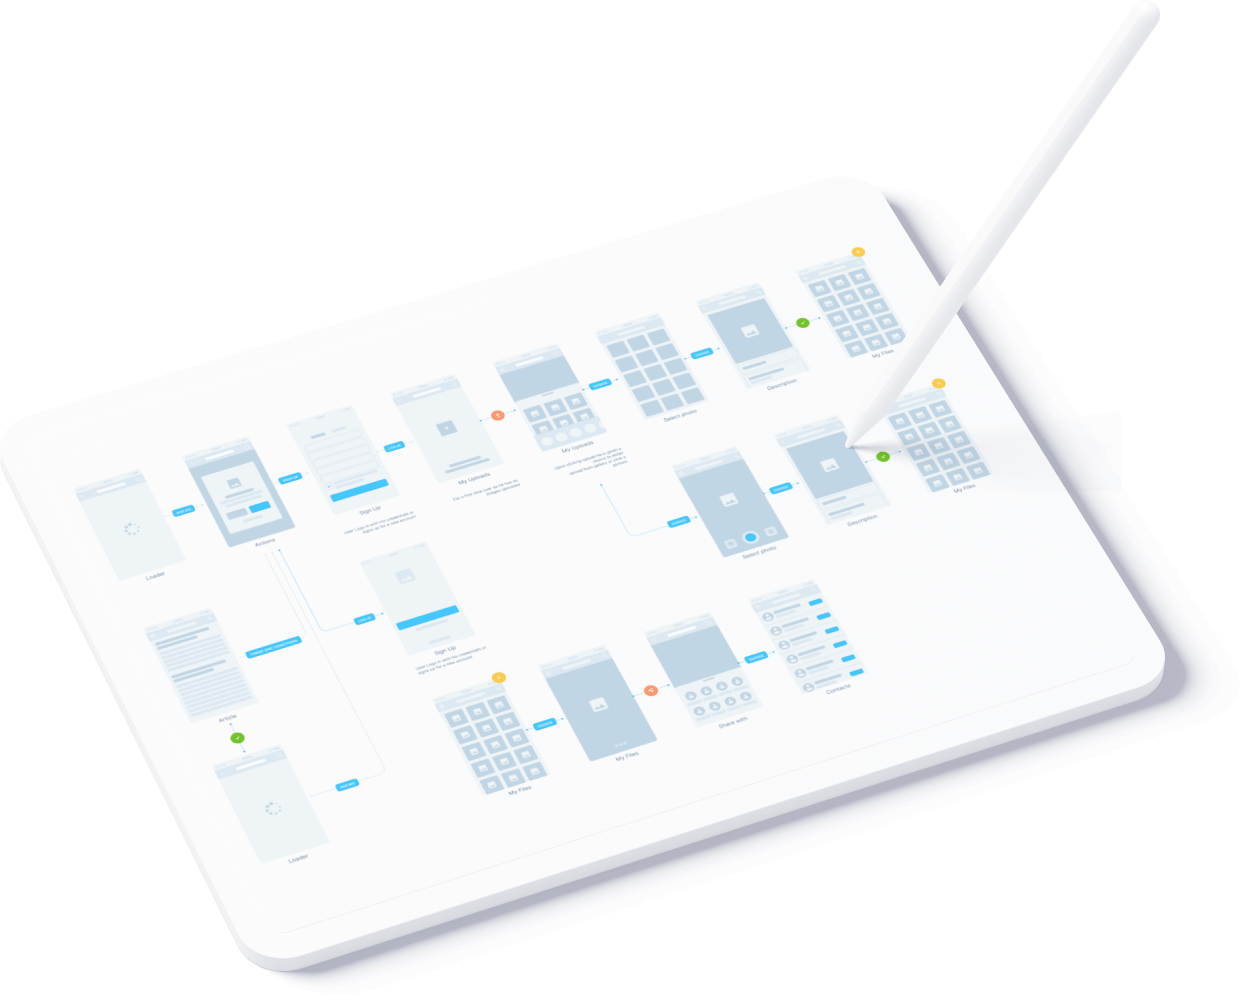 implement a new web framework